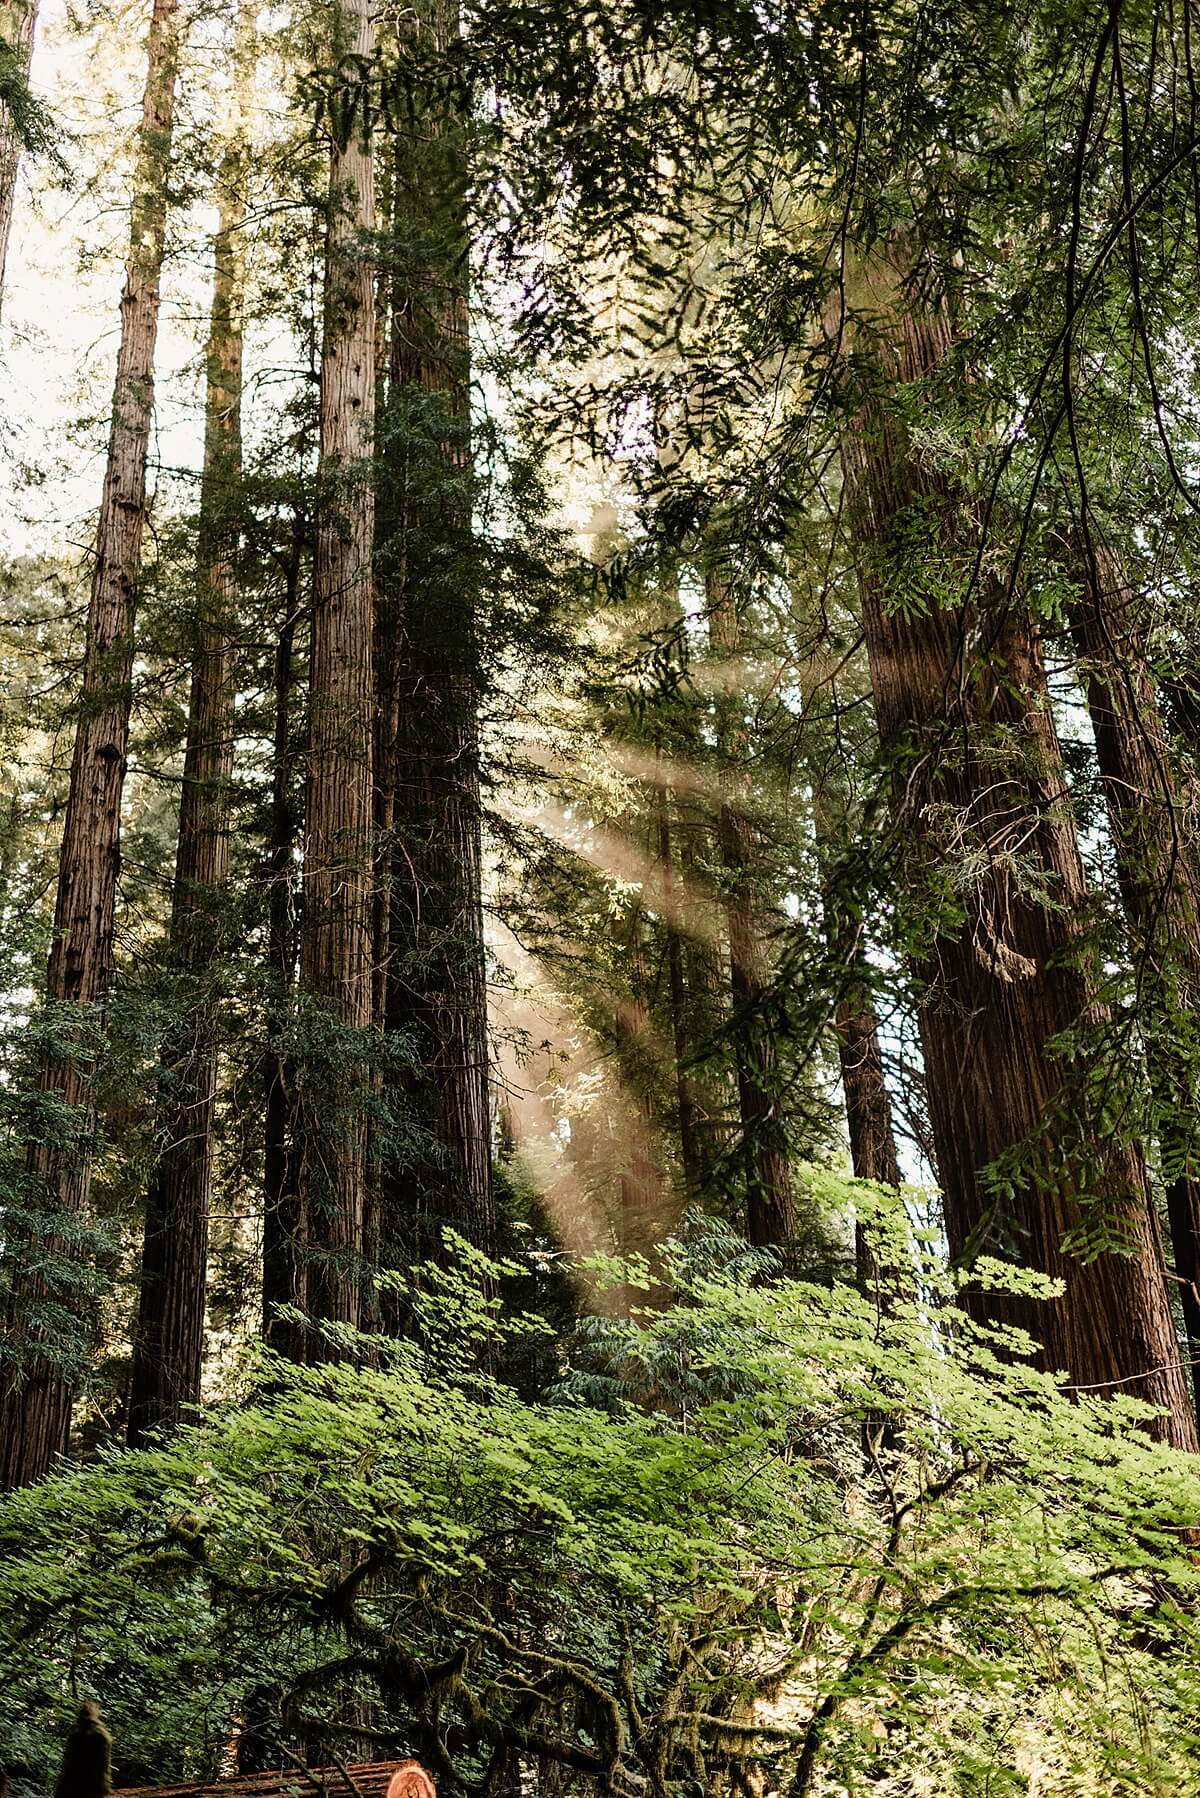 Allison-Brooks-Jedediah-Smiith-Redwoods-Adventure-Elopement-Wedding-S-Photography-Blog_0043.jpg